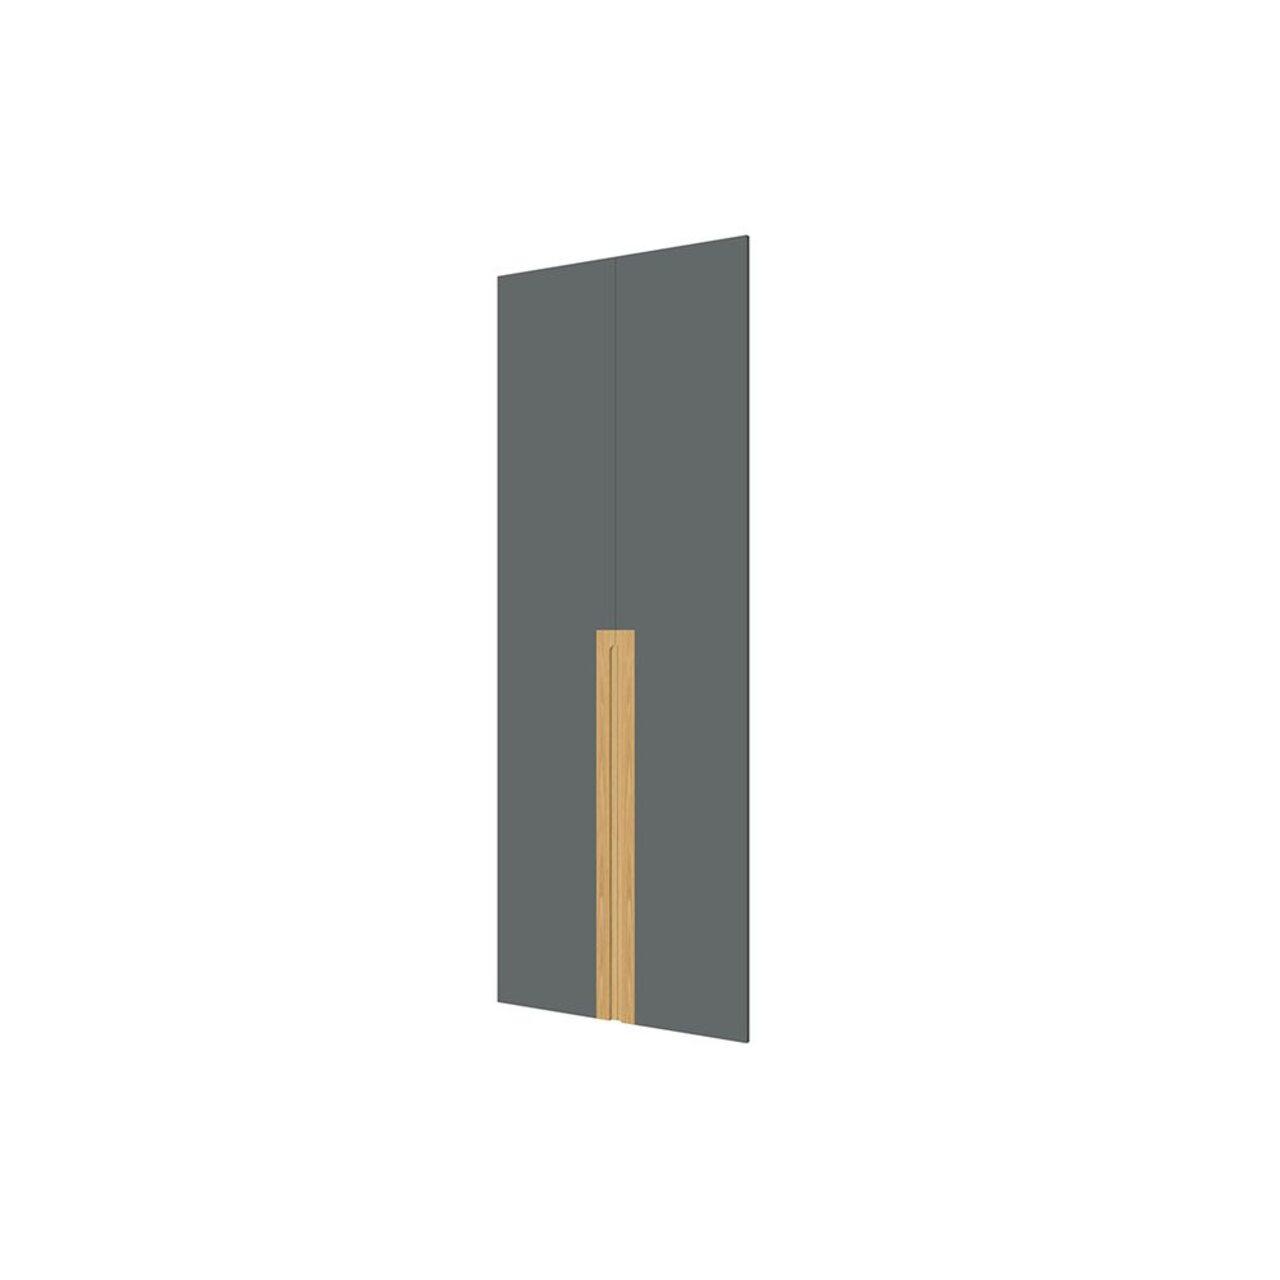 Комплект глухих высоких дверей  Remo 80x2x215 - фото 1